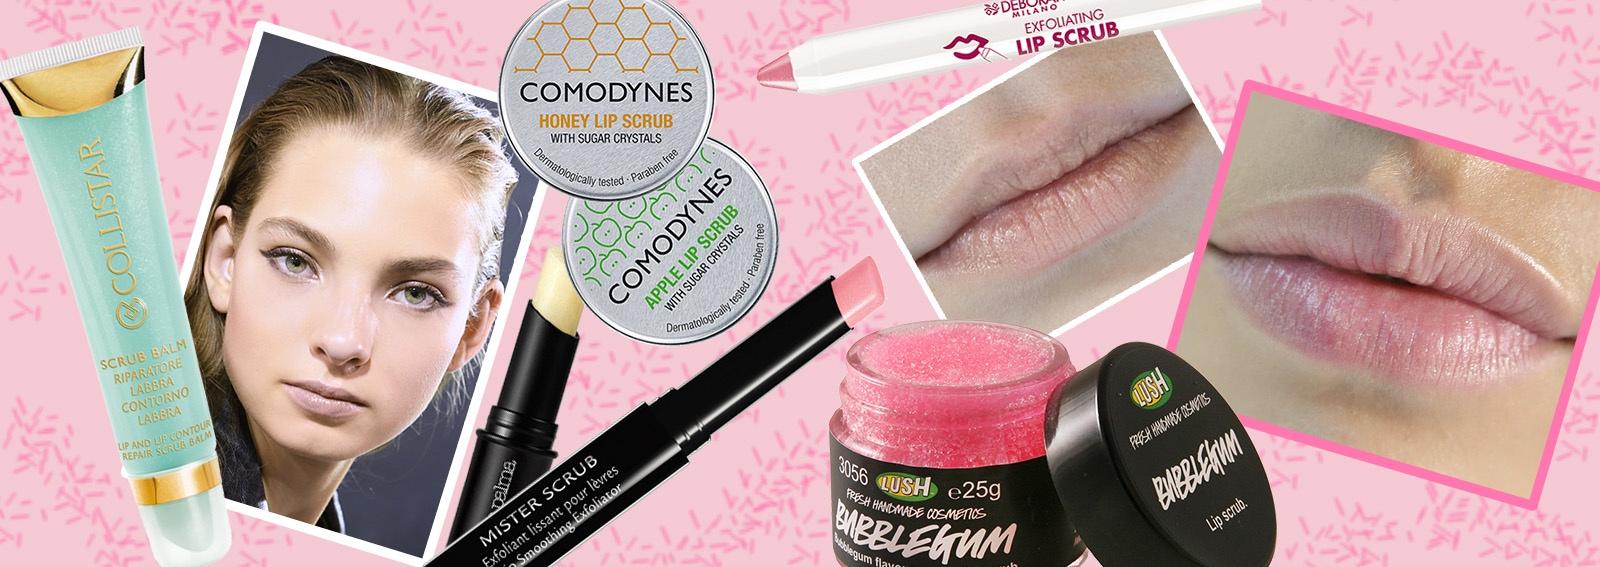 cover-Scrub per labbra idratate e vellutate i prodotti must have-desktop